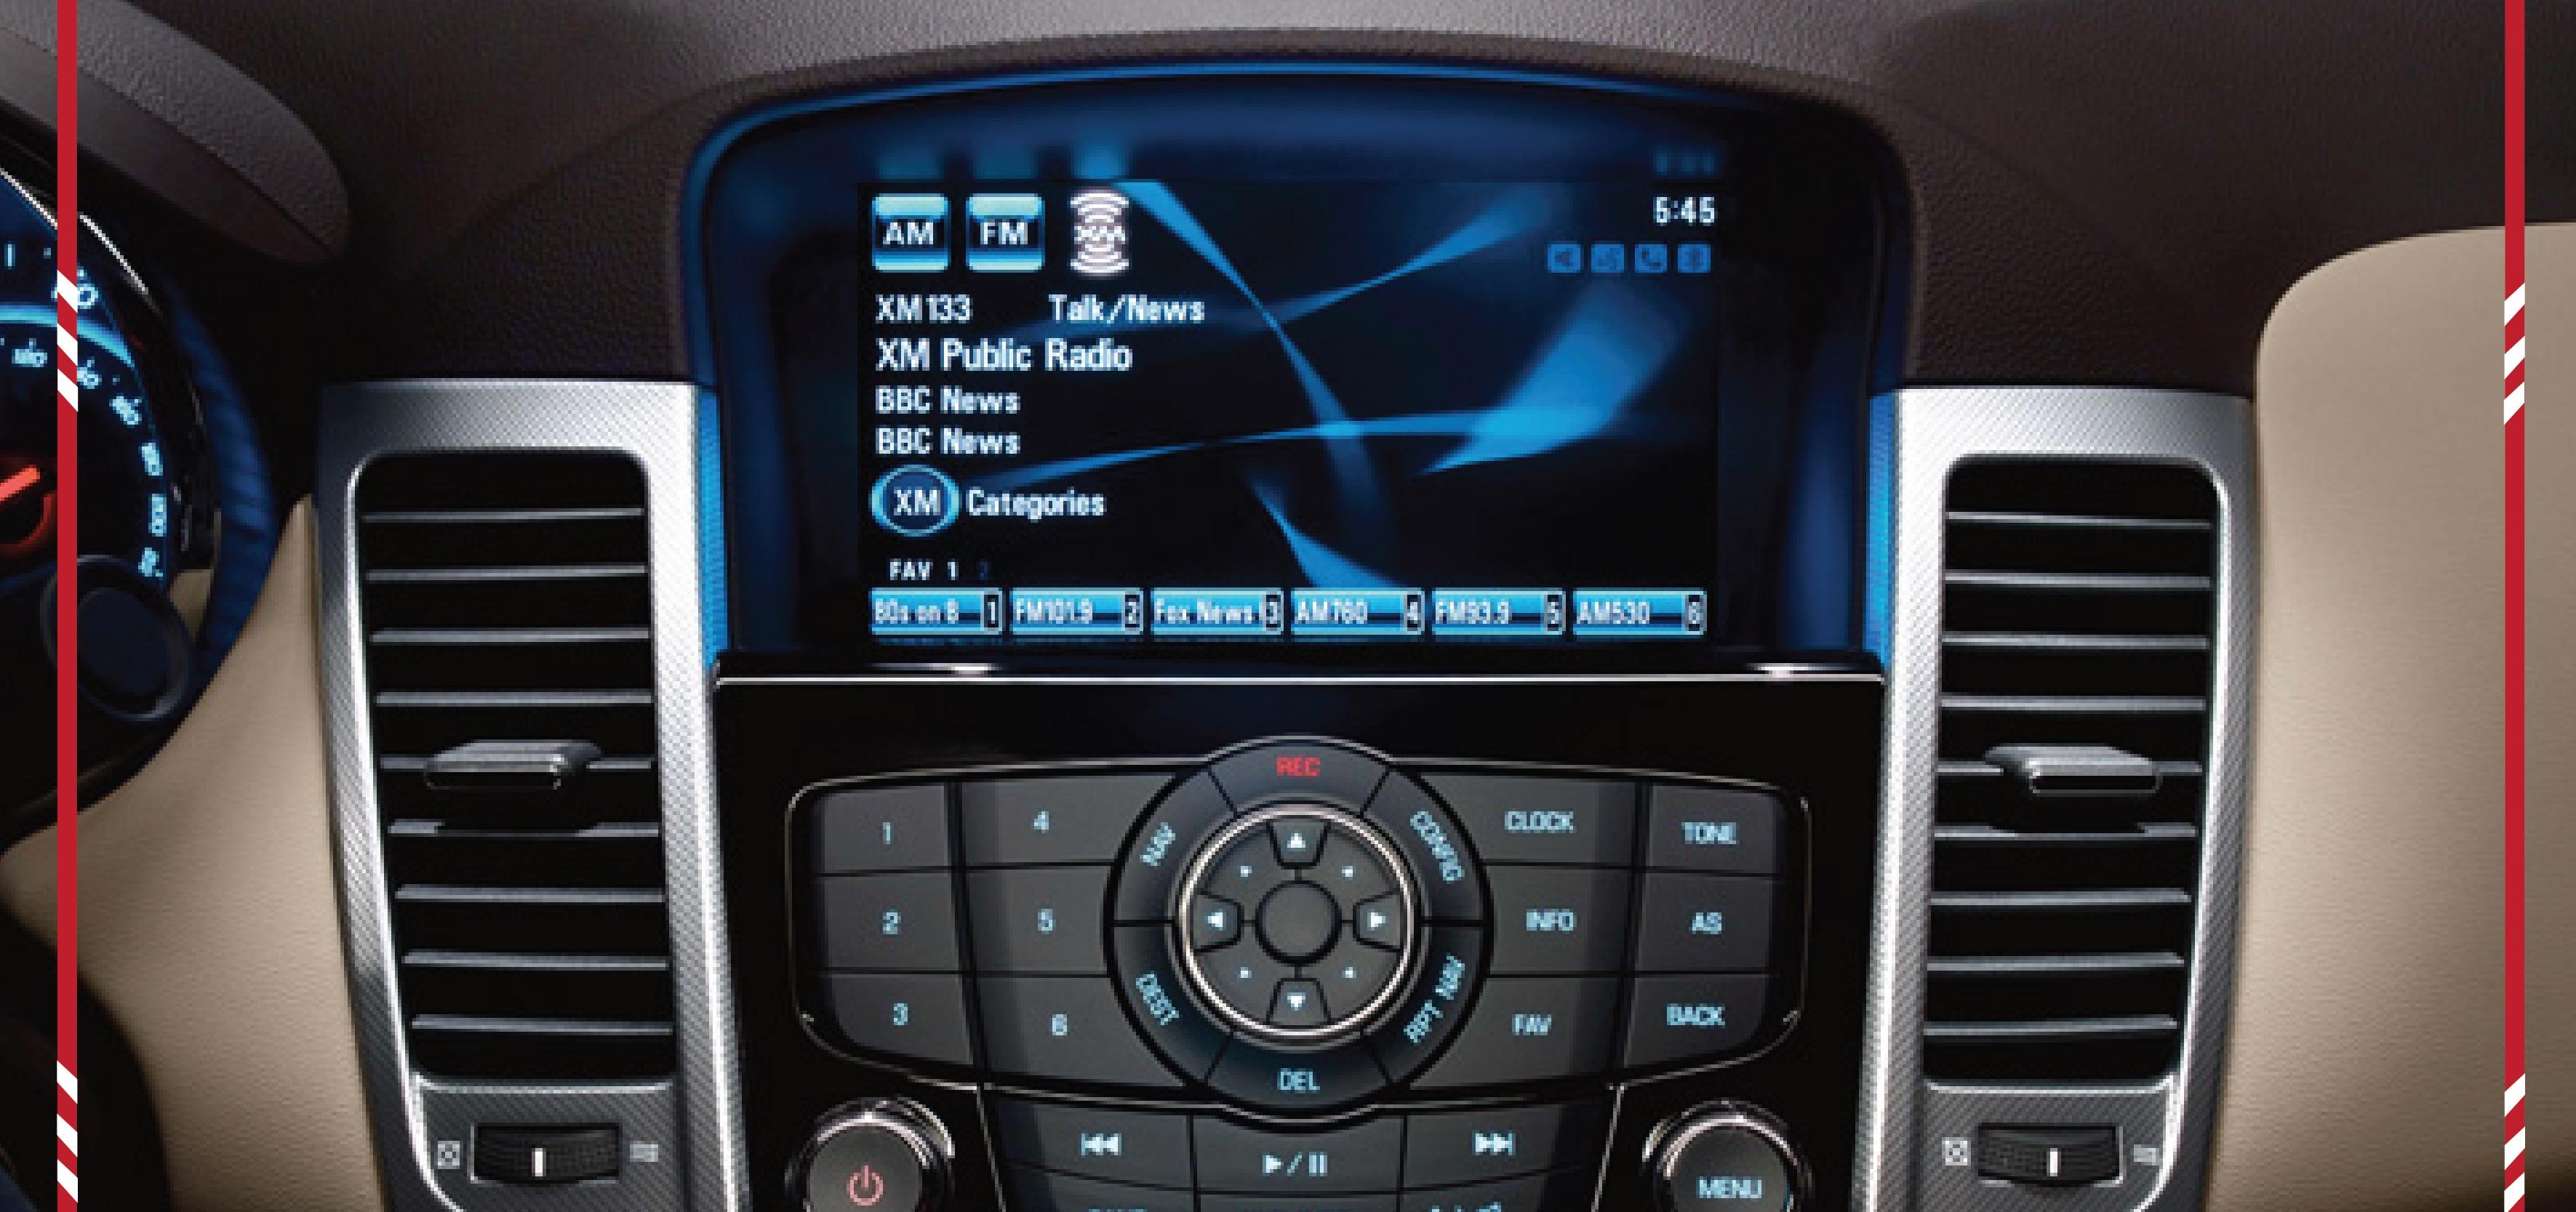 Chevrolet Cruze Interior 2